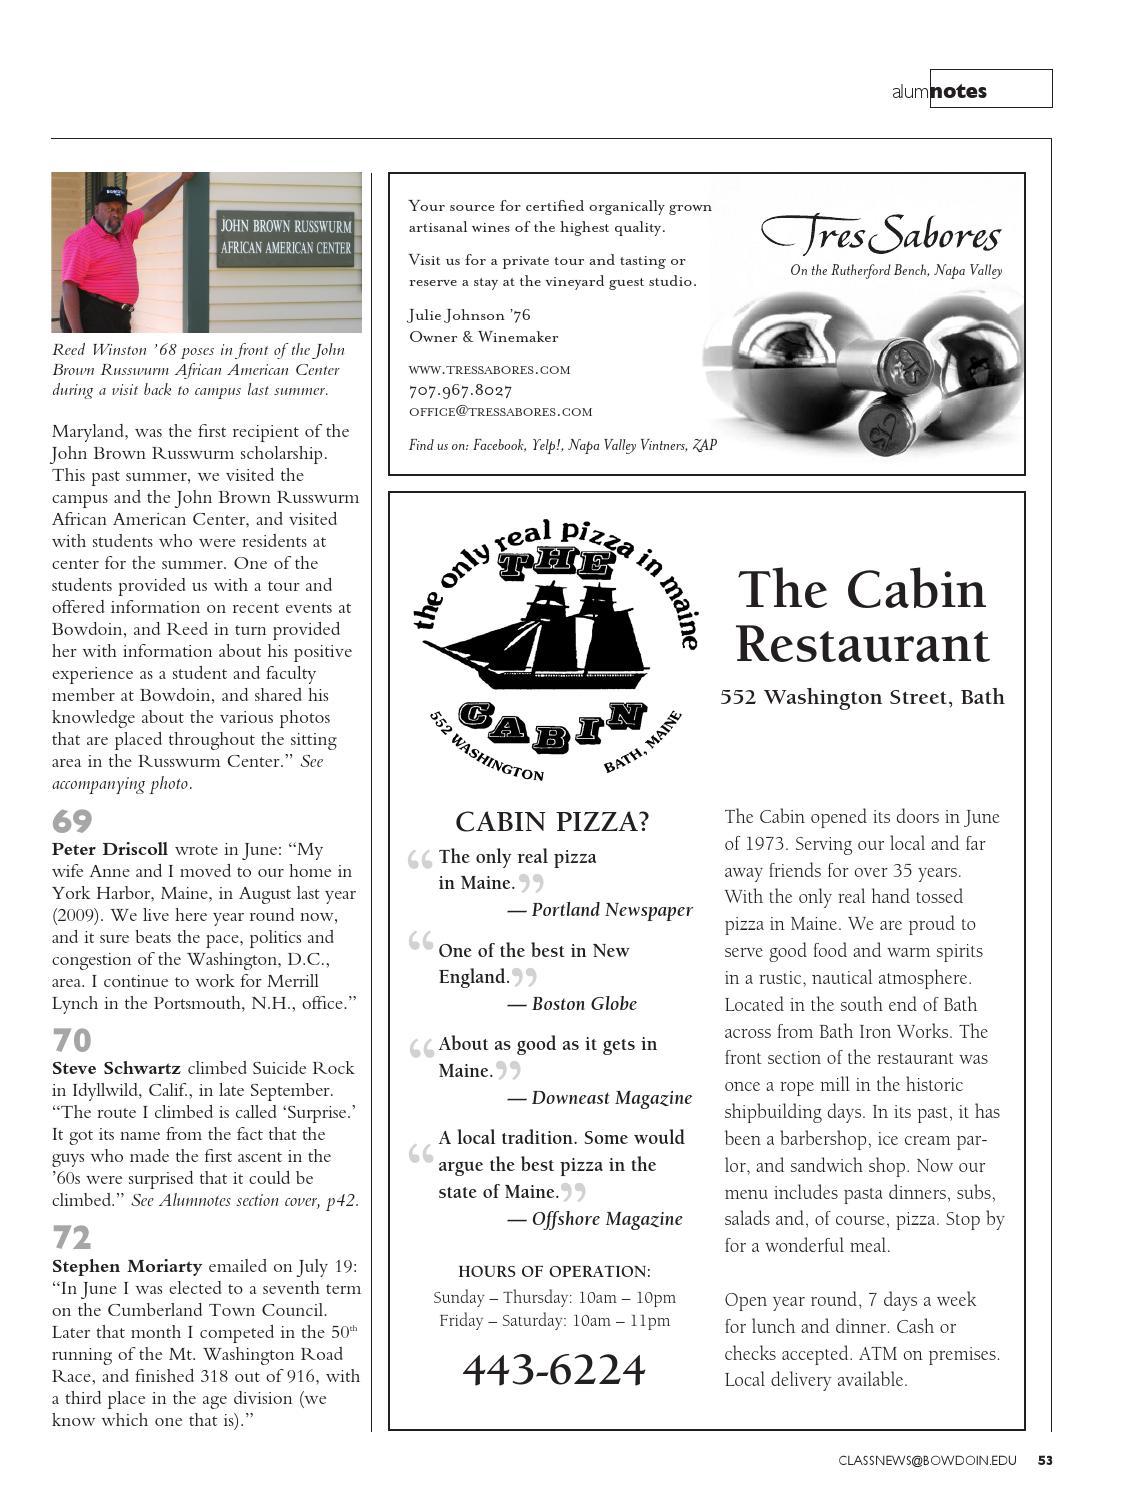 Bowdoin Magazine, Vol  82, No  1, Winter 2011 by Bowdoin